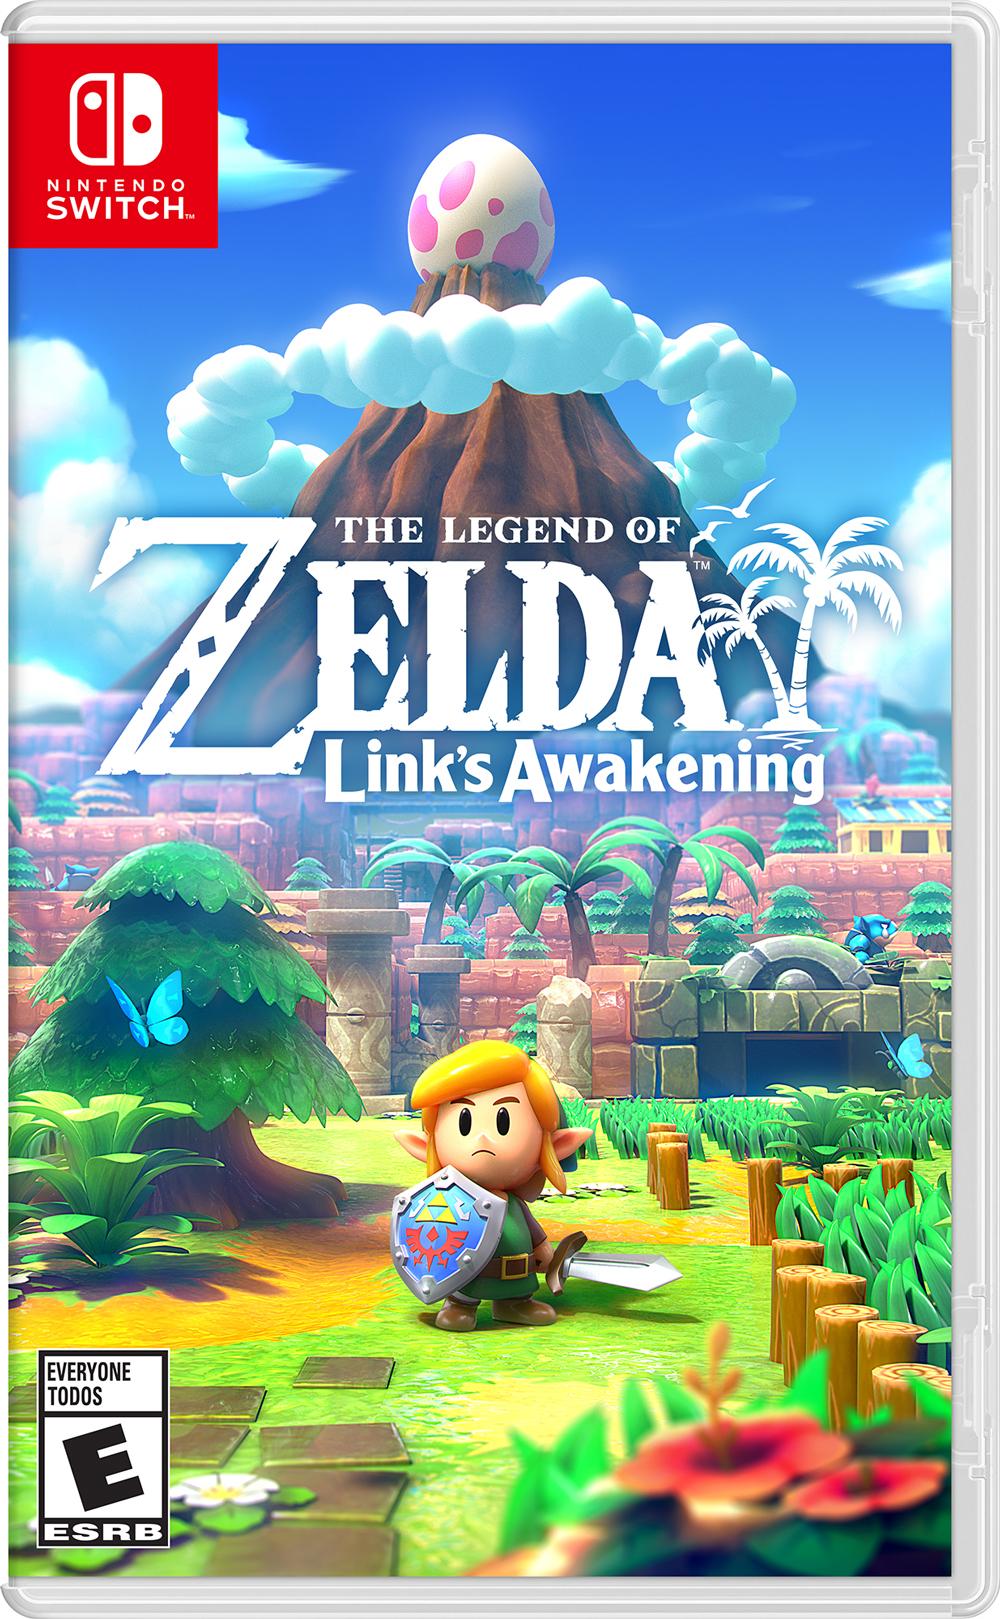 Fire Emblem: Three Houses, The Legend of Zelda: Link's Awakening $49.94 each